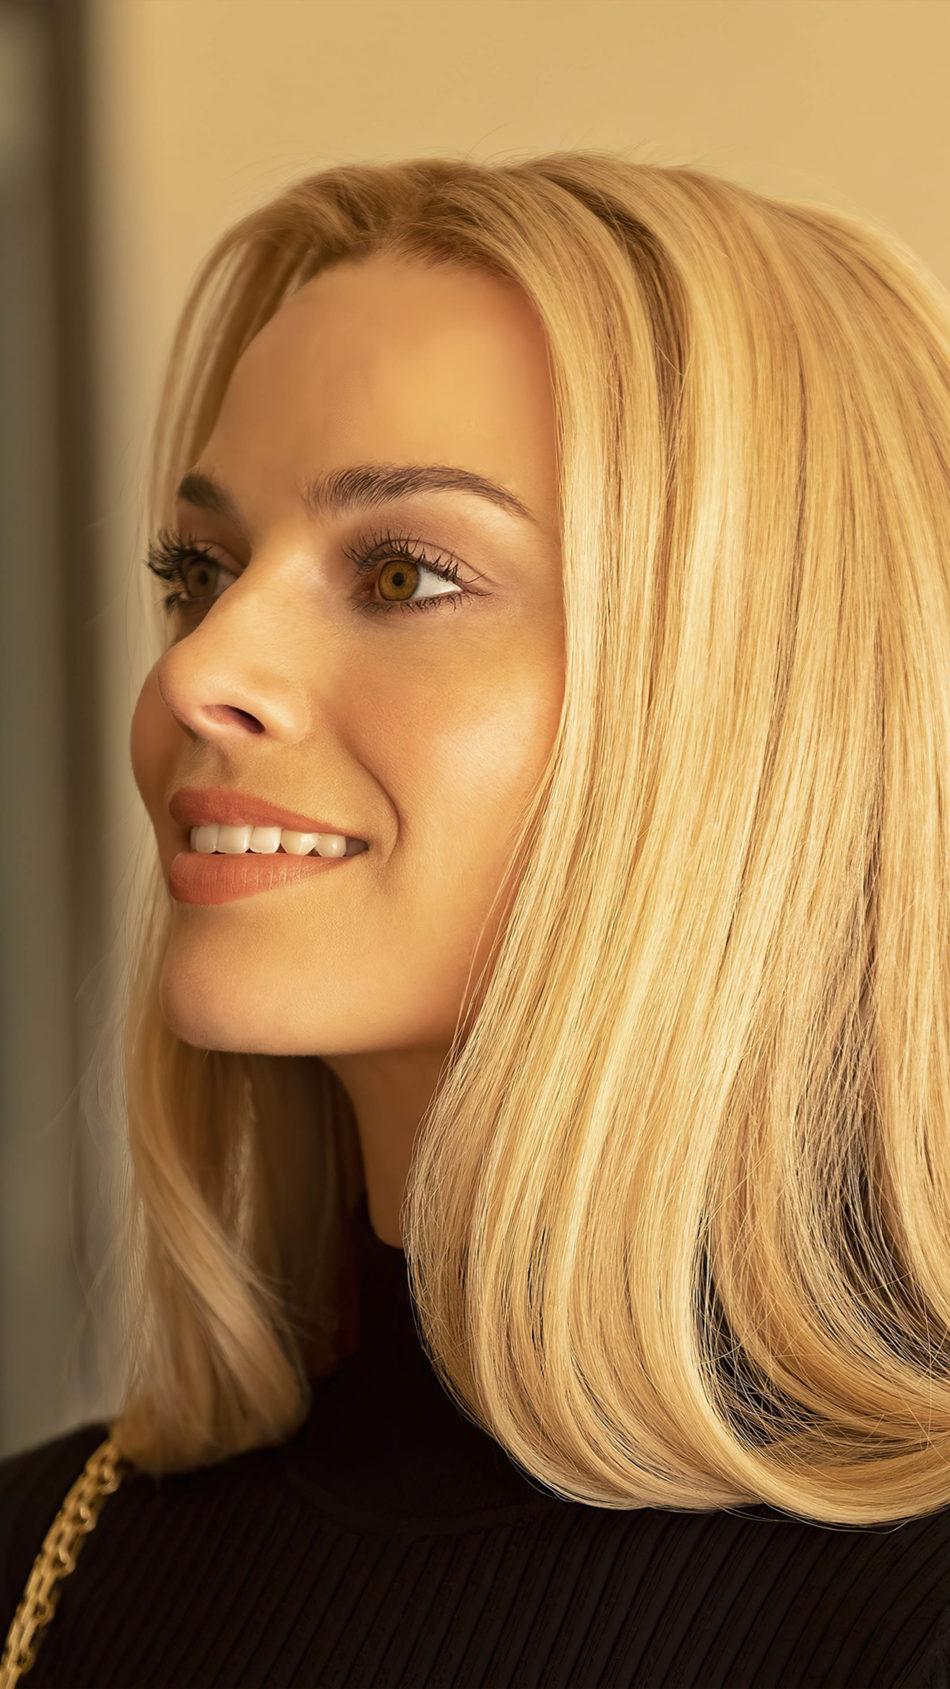 Margot Robbie Blonde Hair 4K Ultra HD Mobile Wallpaper